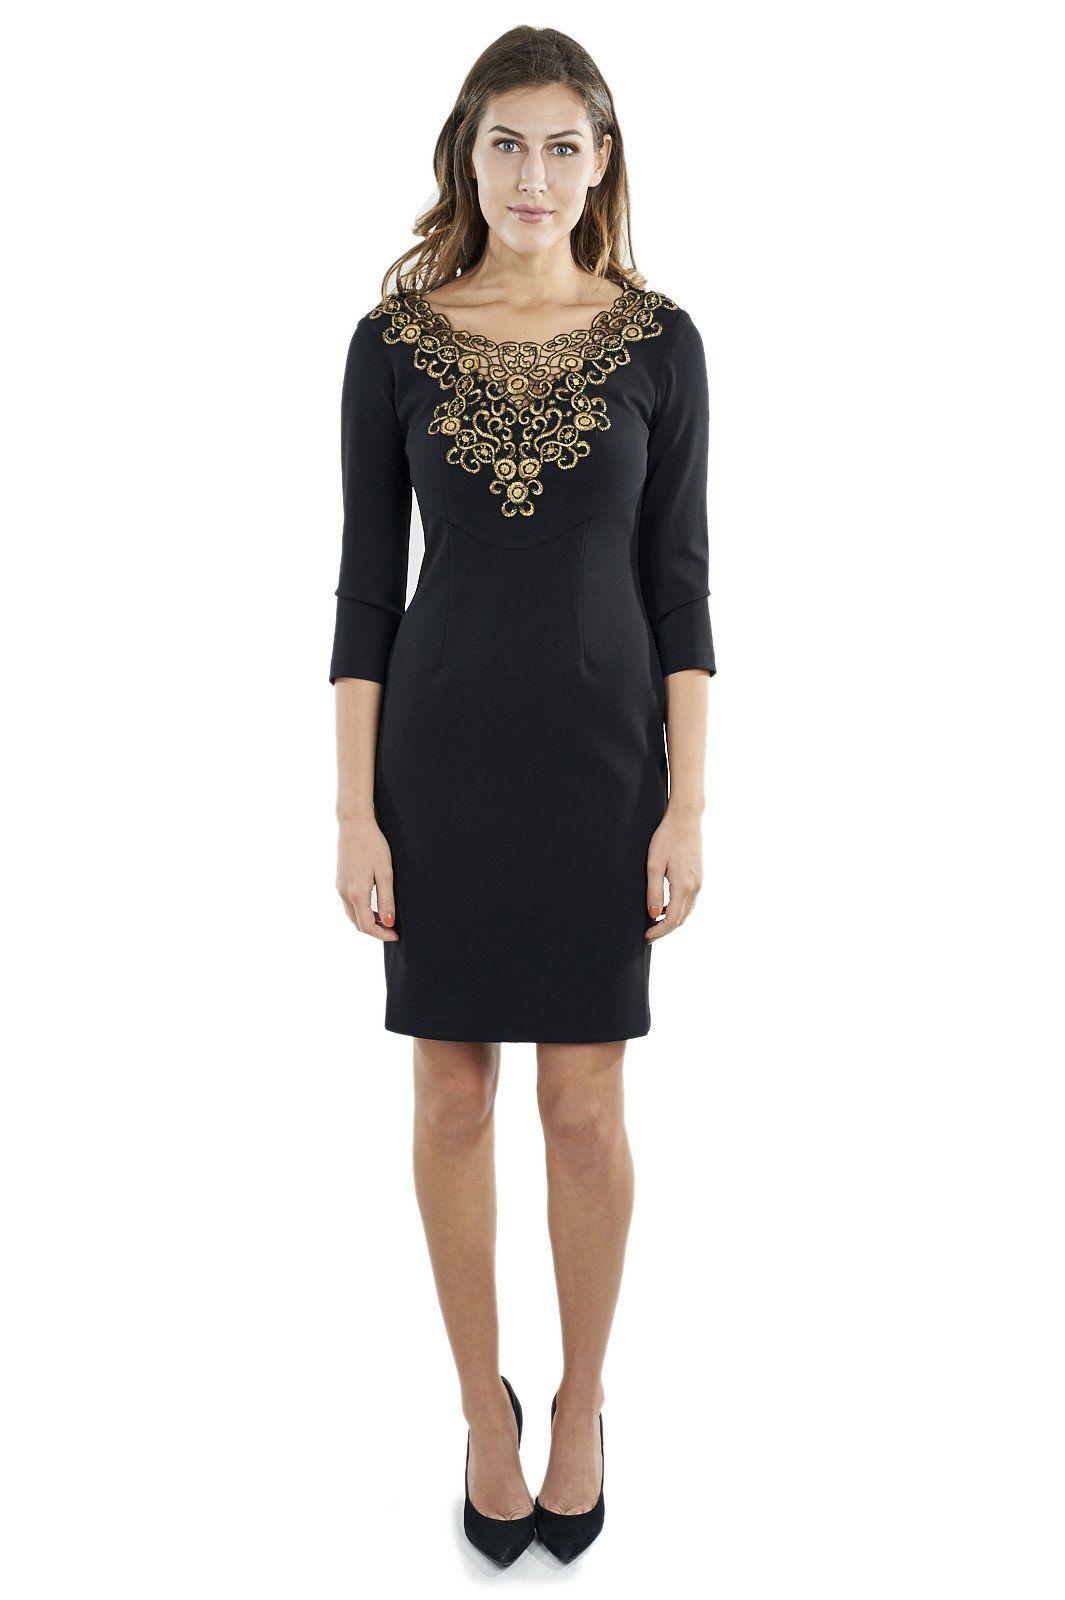 Long Sleeve Cocktail Dress with Gold Embellished Neckline